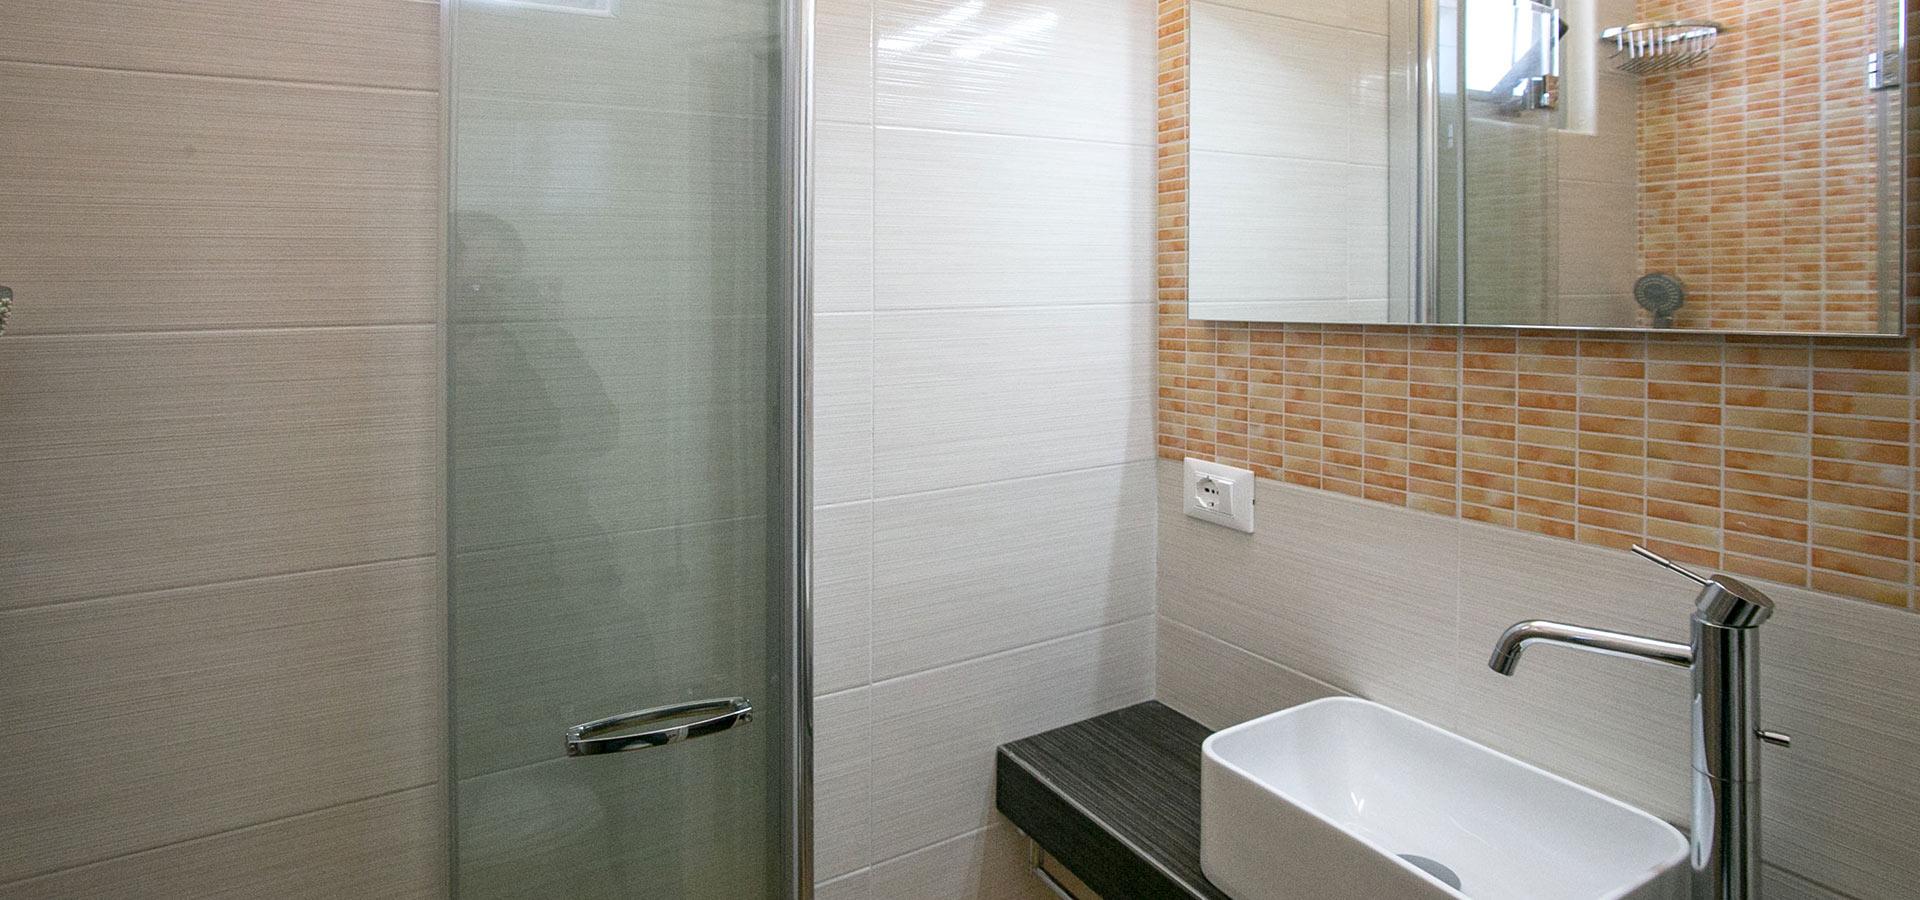 bagni ristrutturati Litz